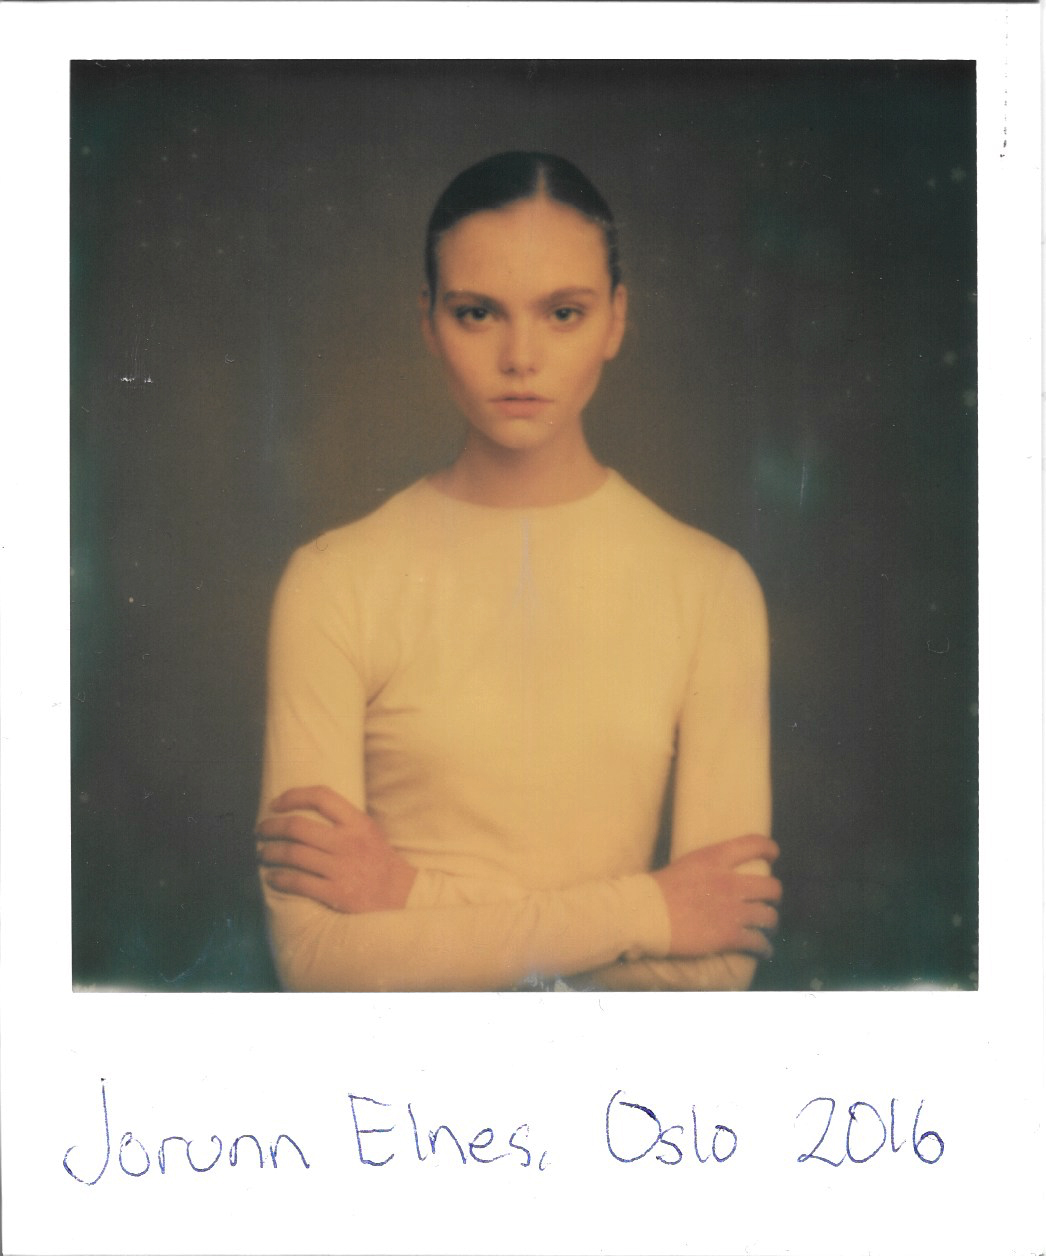 Jorunn polaroid 3.jpg